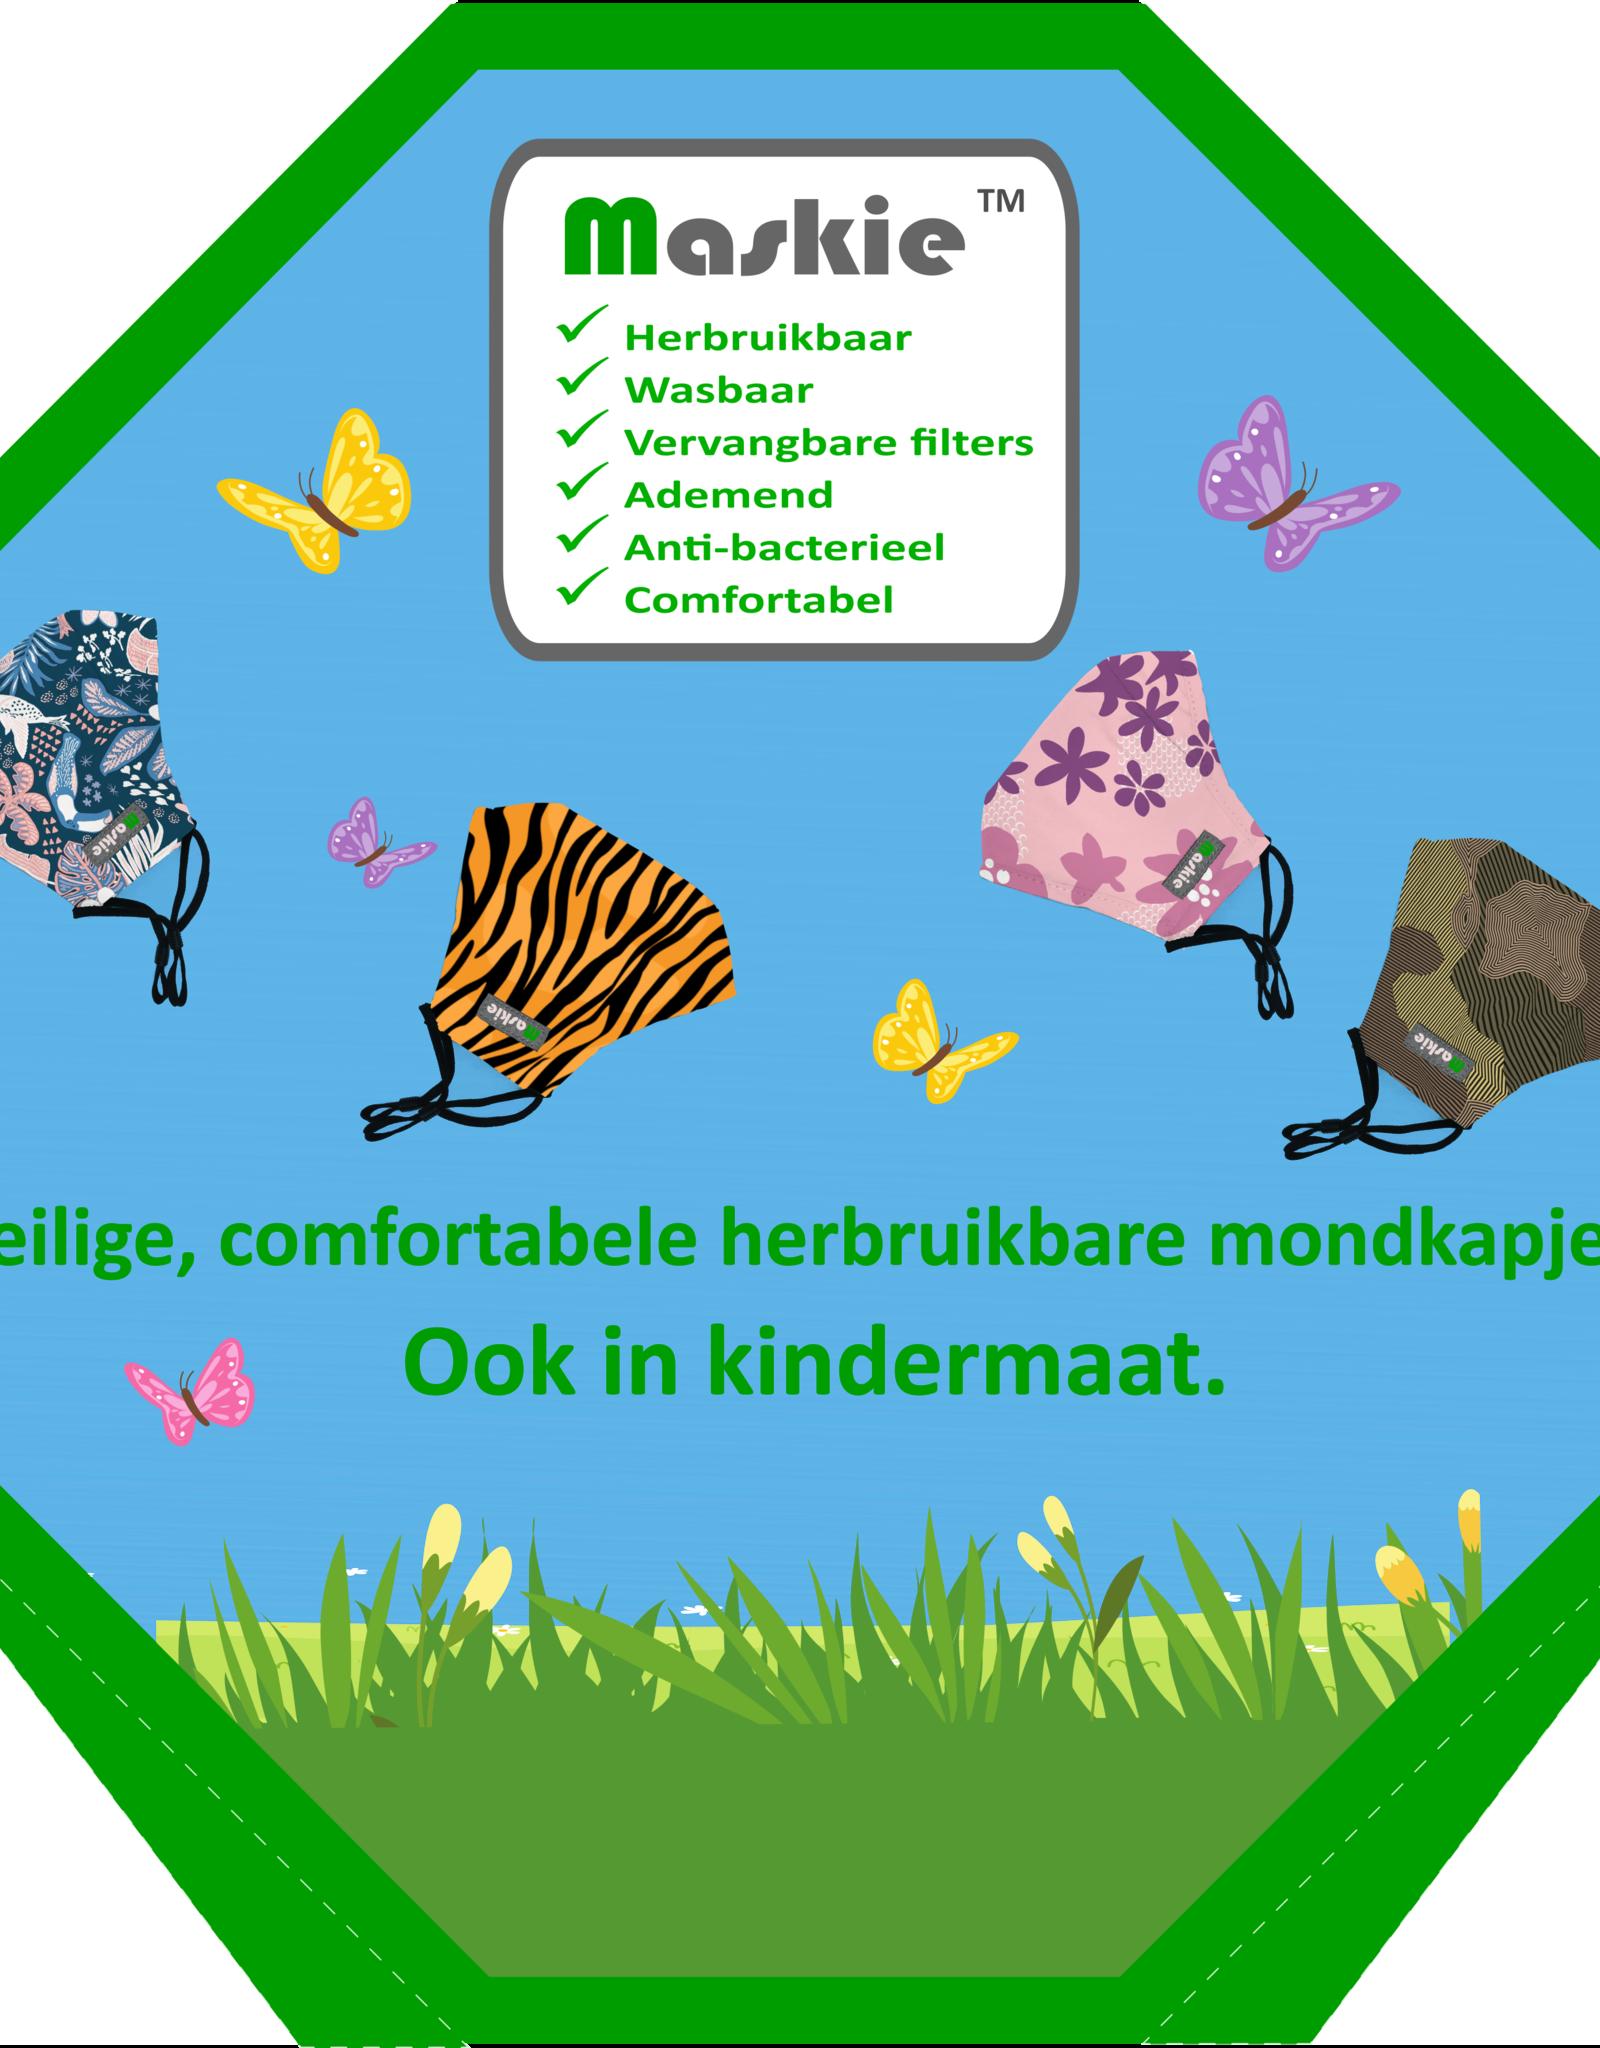 Maskie Maskie Molen - 80 Maskie mondkapjes + BONUS 18 Artist Line (tot 7 november)